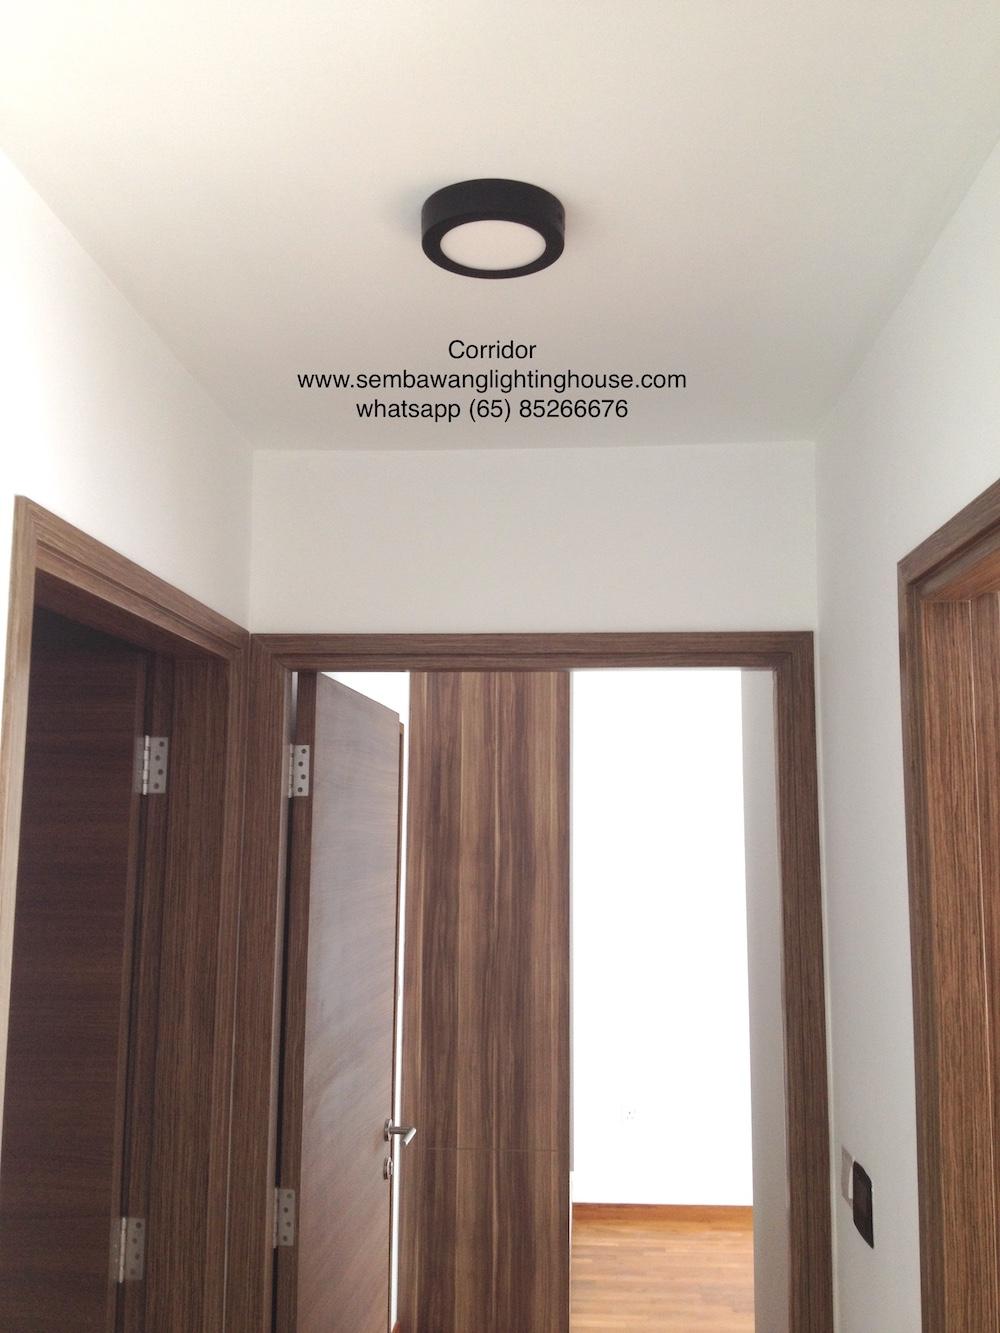 plain-round-ceiling-lamp-sample02-corridor-sembawang-lighting-house.jpg